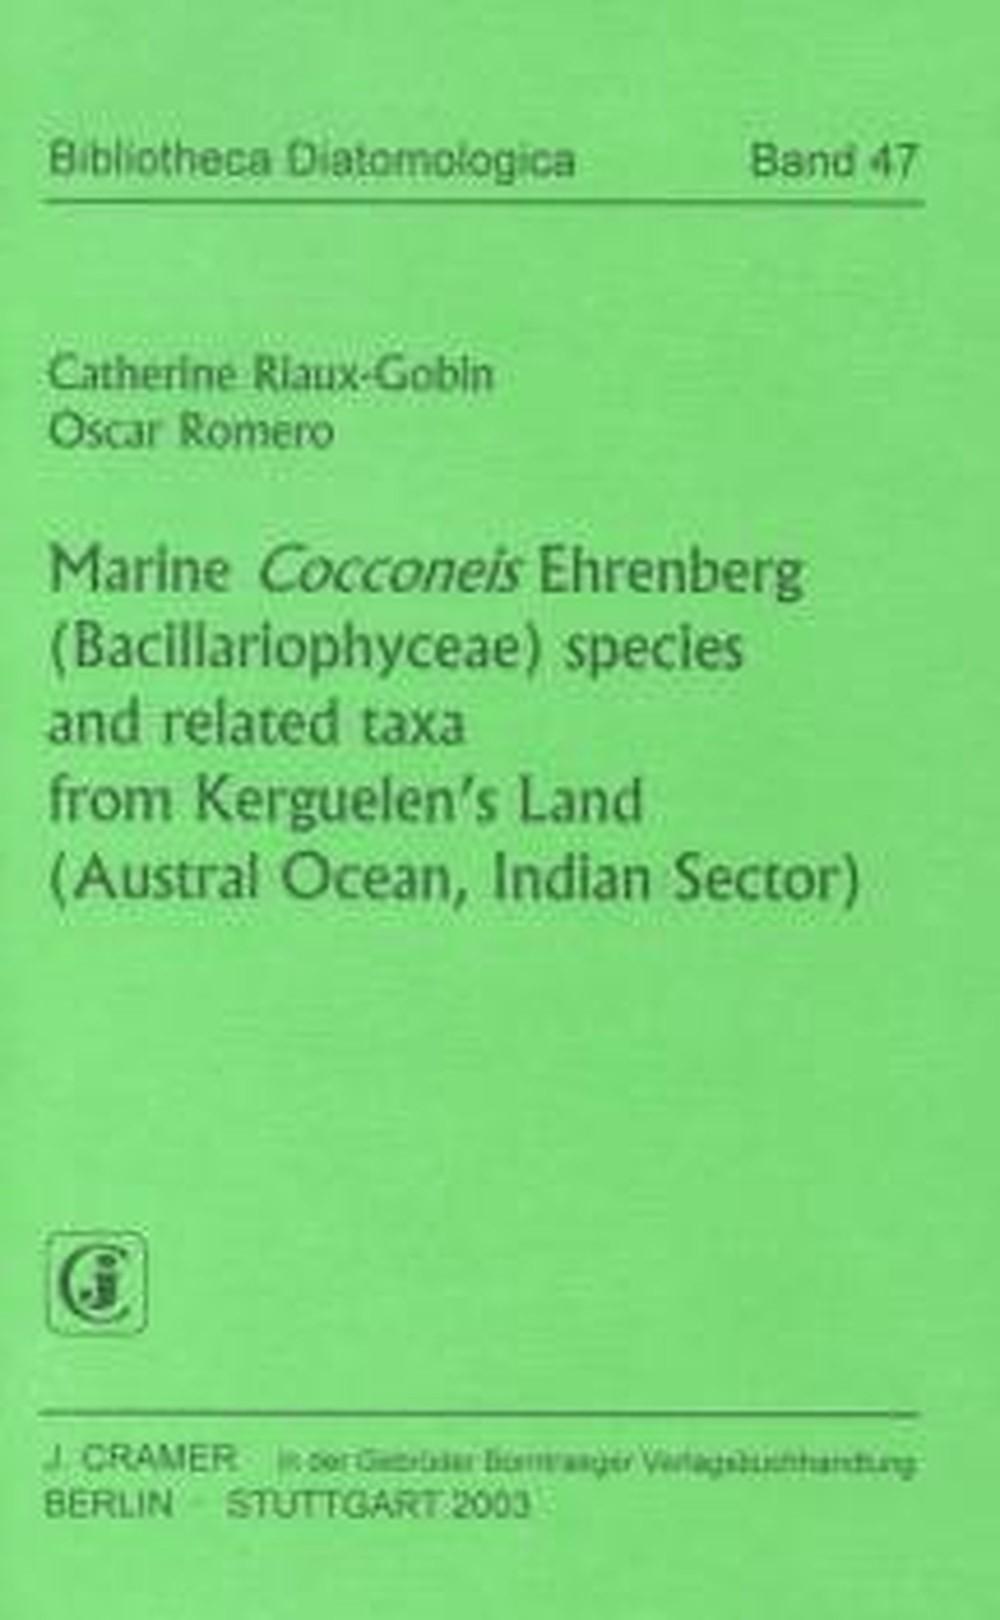 Abbildung von Riaux-Gobin / Romero | Marine Cocconeis Ehrenberg (Bacillariophyceae) species and related taxa from Kerguelen's Land (Austral Ocean, Indian Sector) | 2003